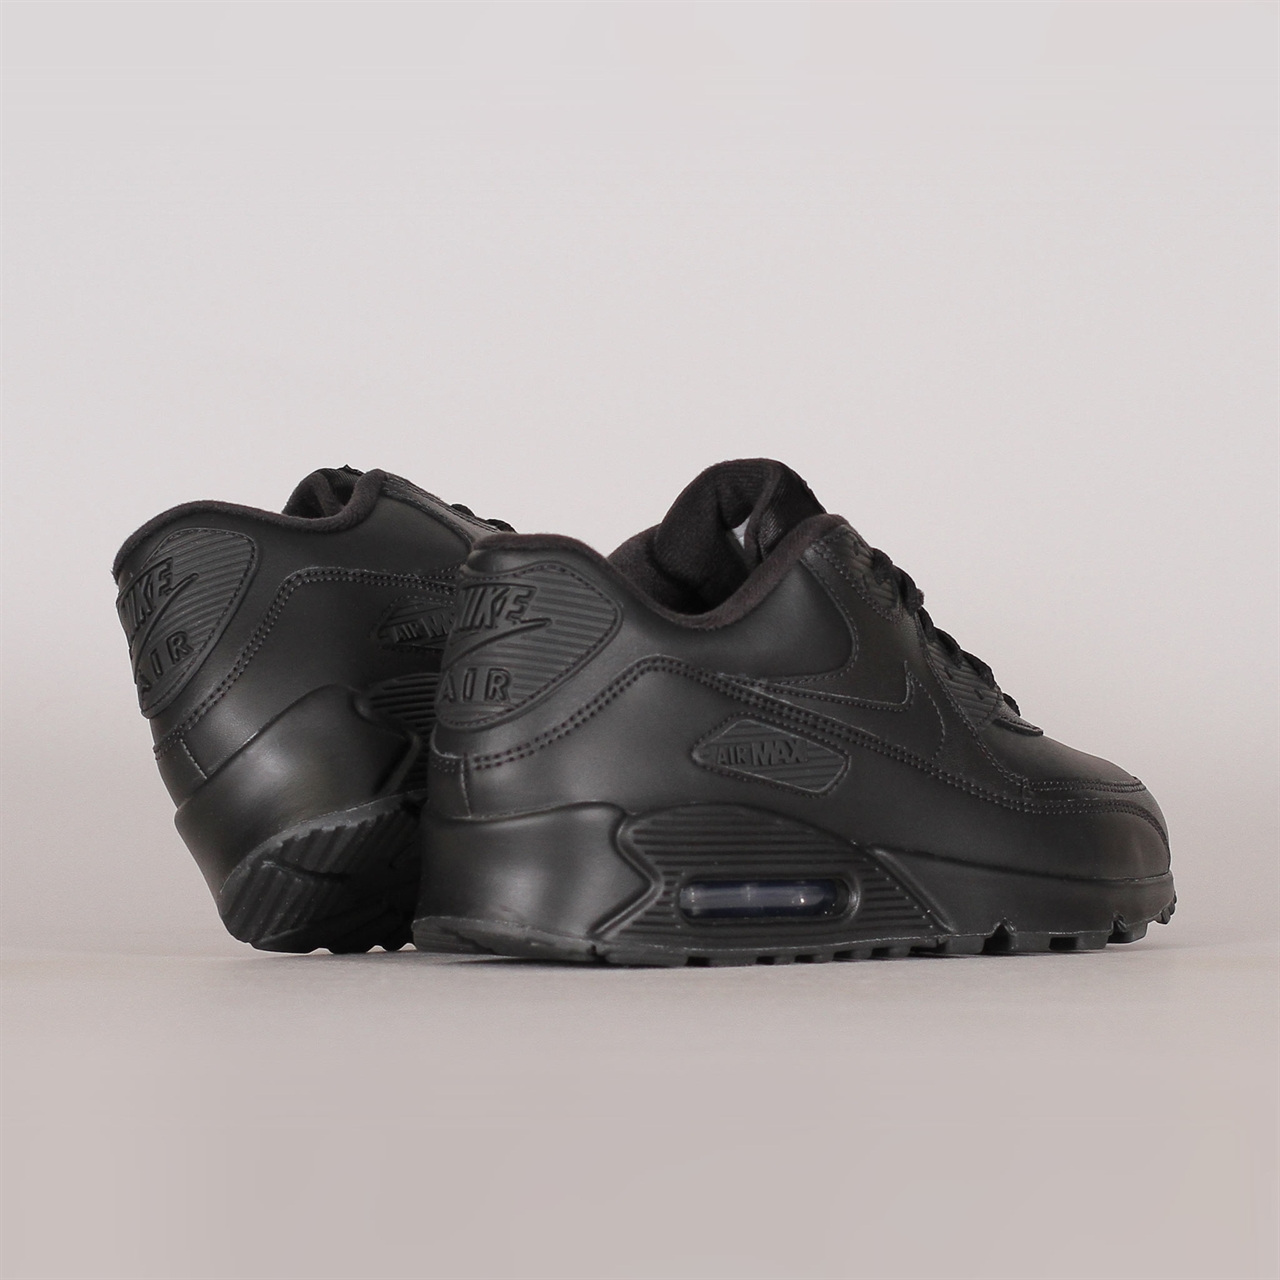 pretty nice a25e1 08684 Nike SportswearNike Sportswear Air Max 90 Leather (302519-001). 1